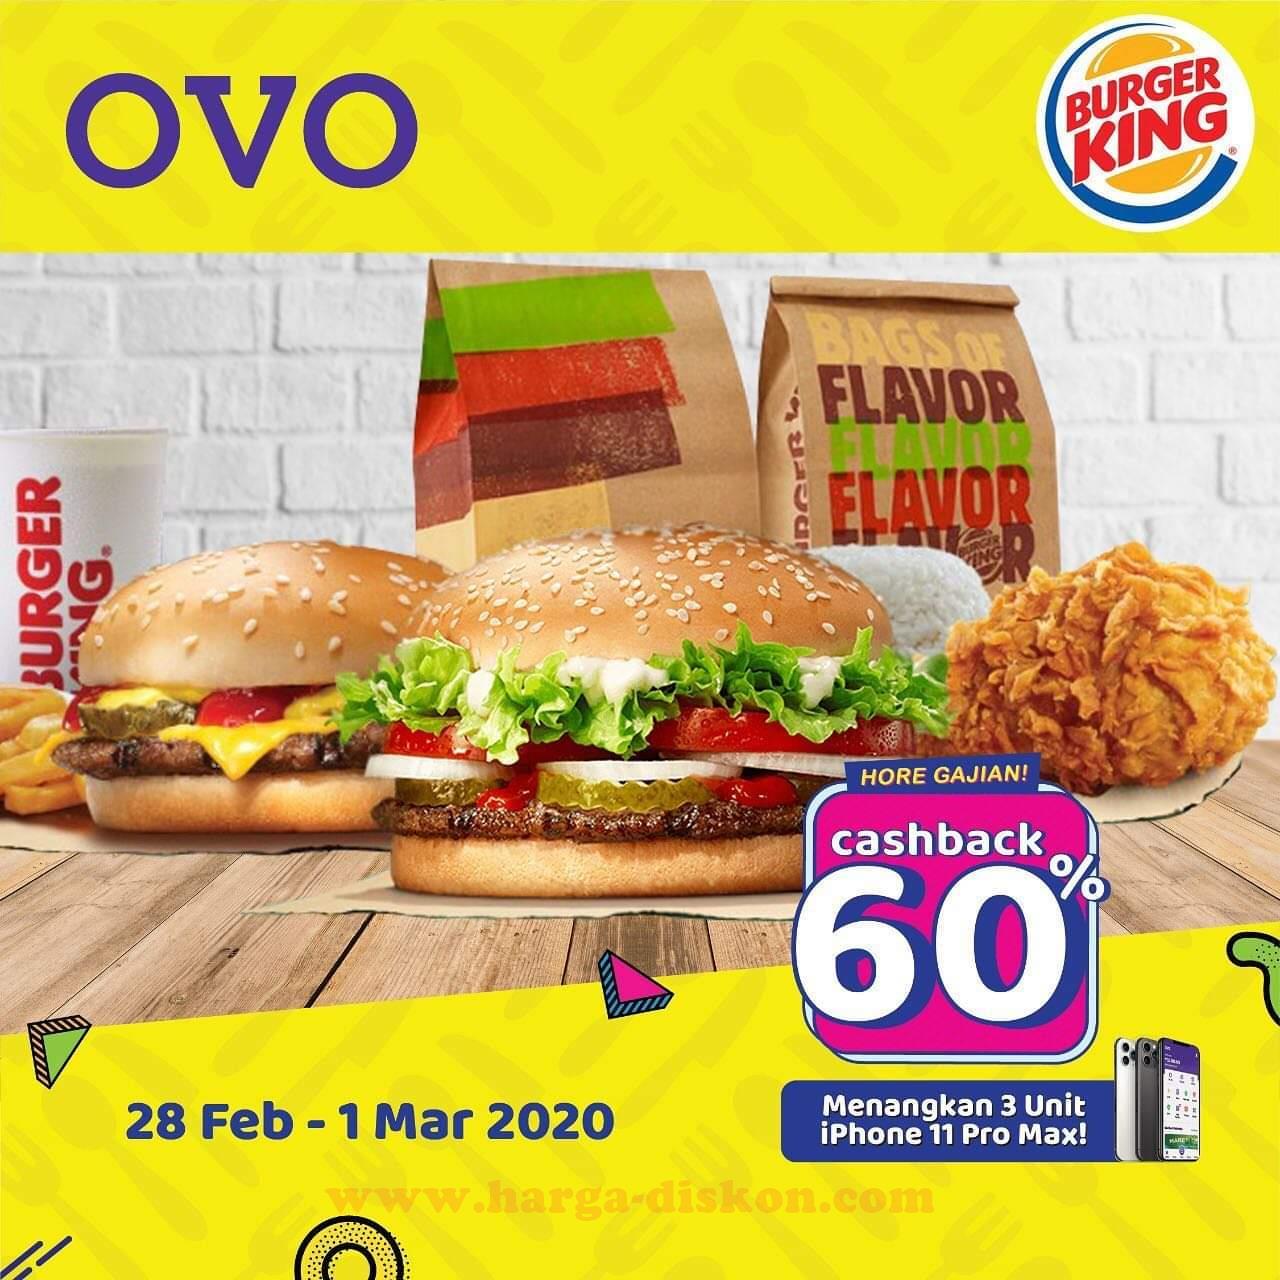 Promo Burger King Cashback 60 Dengan Ovo Periode 28 Februari 1 Maret 2020 Harga Diskon